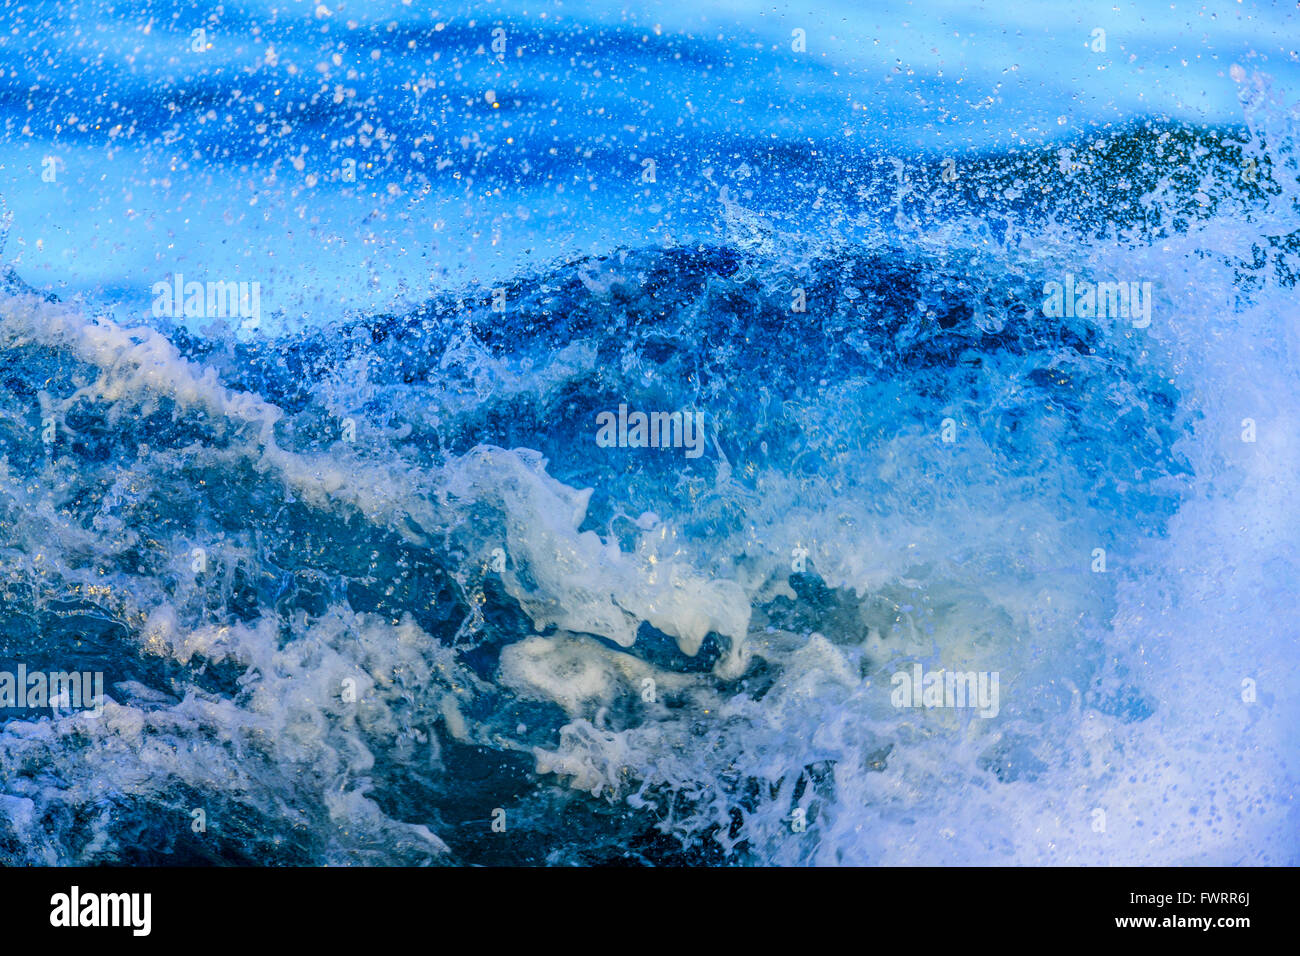 Las olas en la costa de Maui closeup Foto de stock